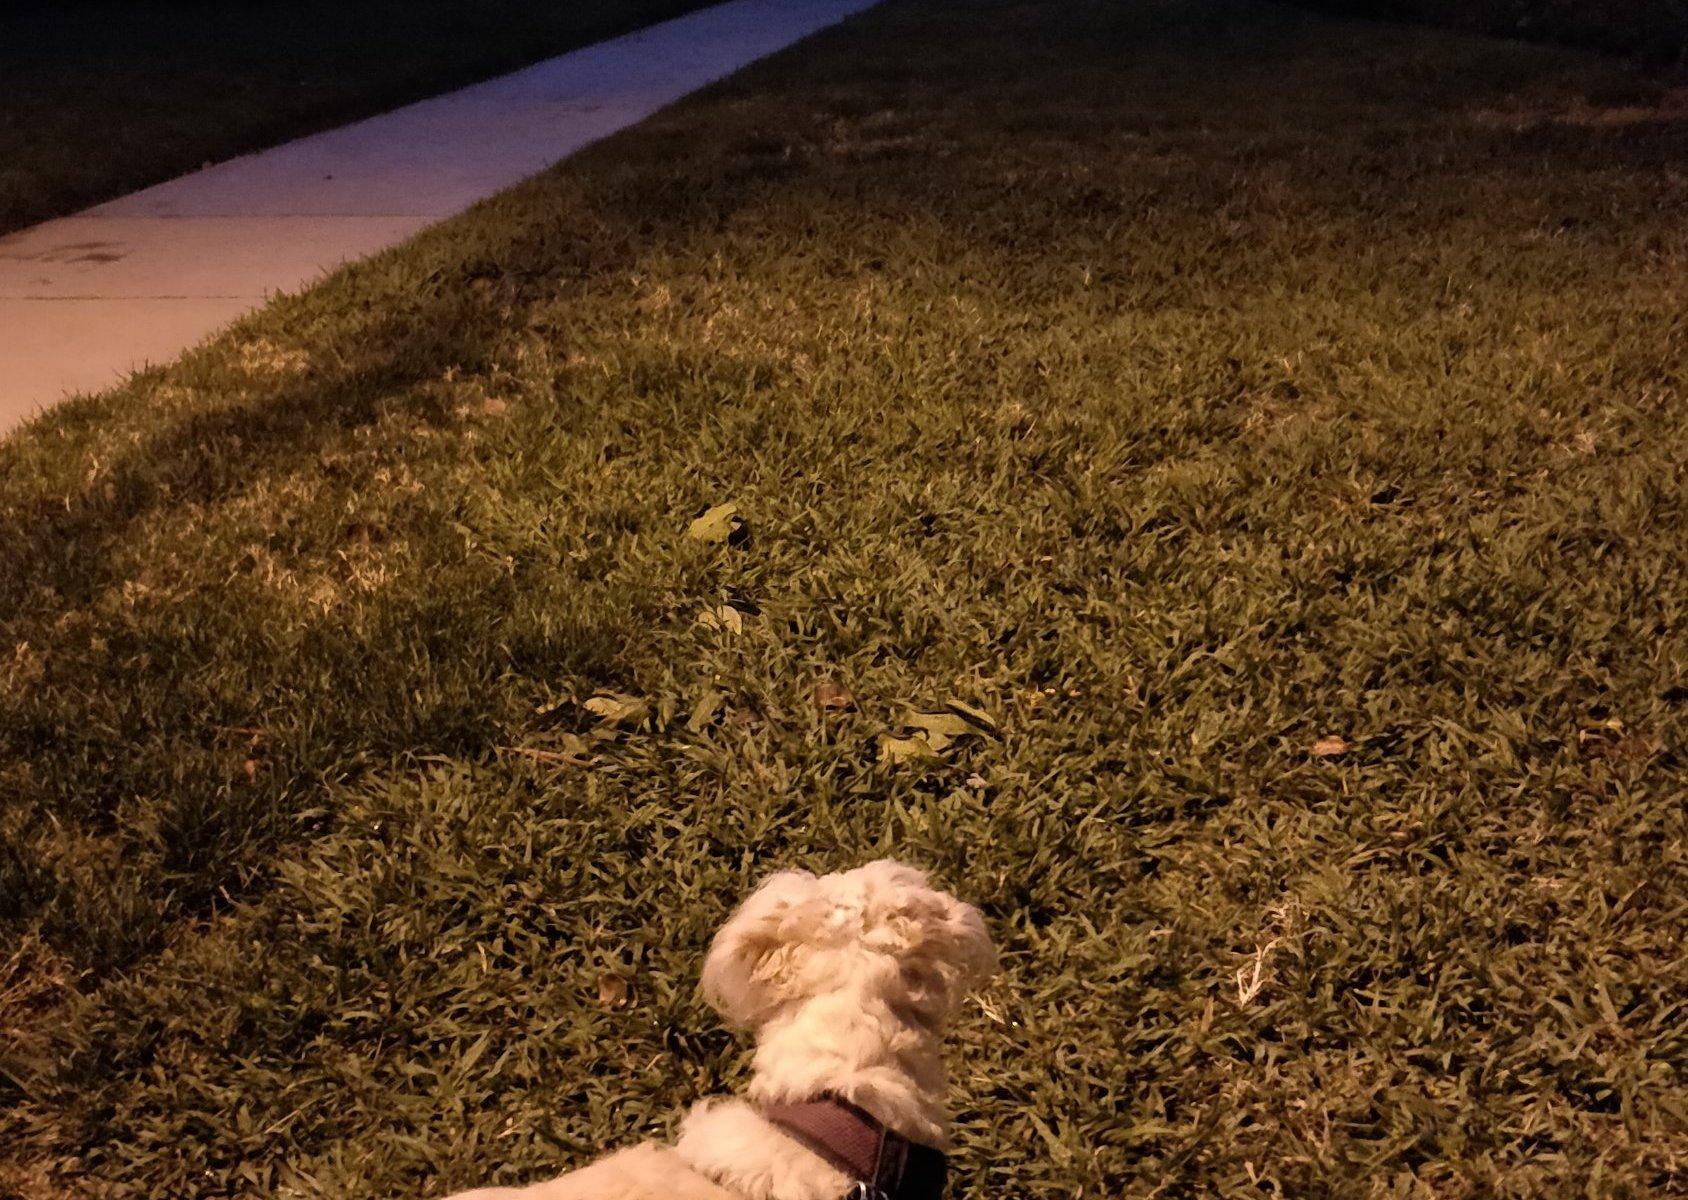 Lilo staring down the sidewalk